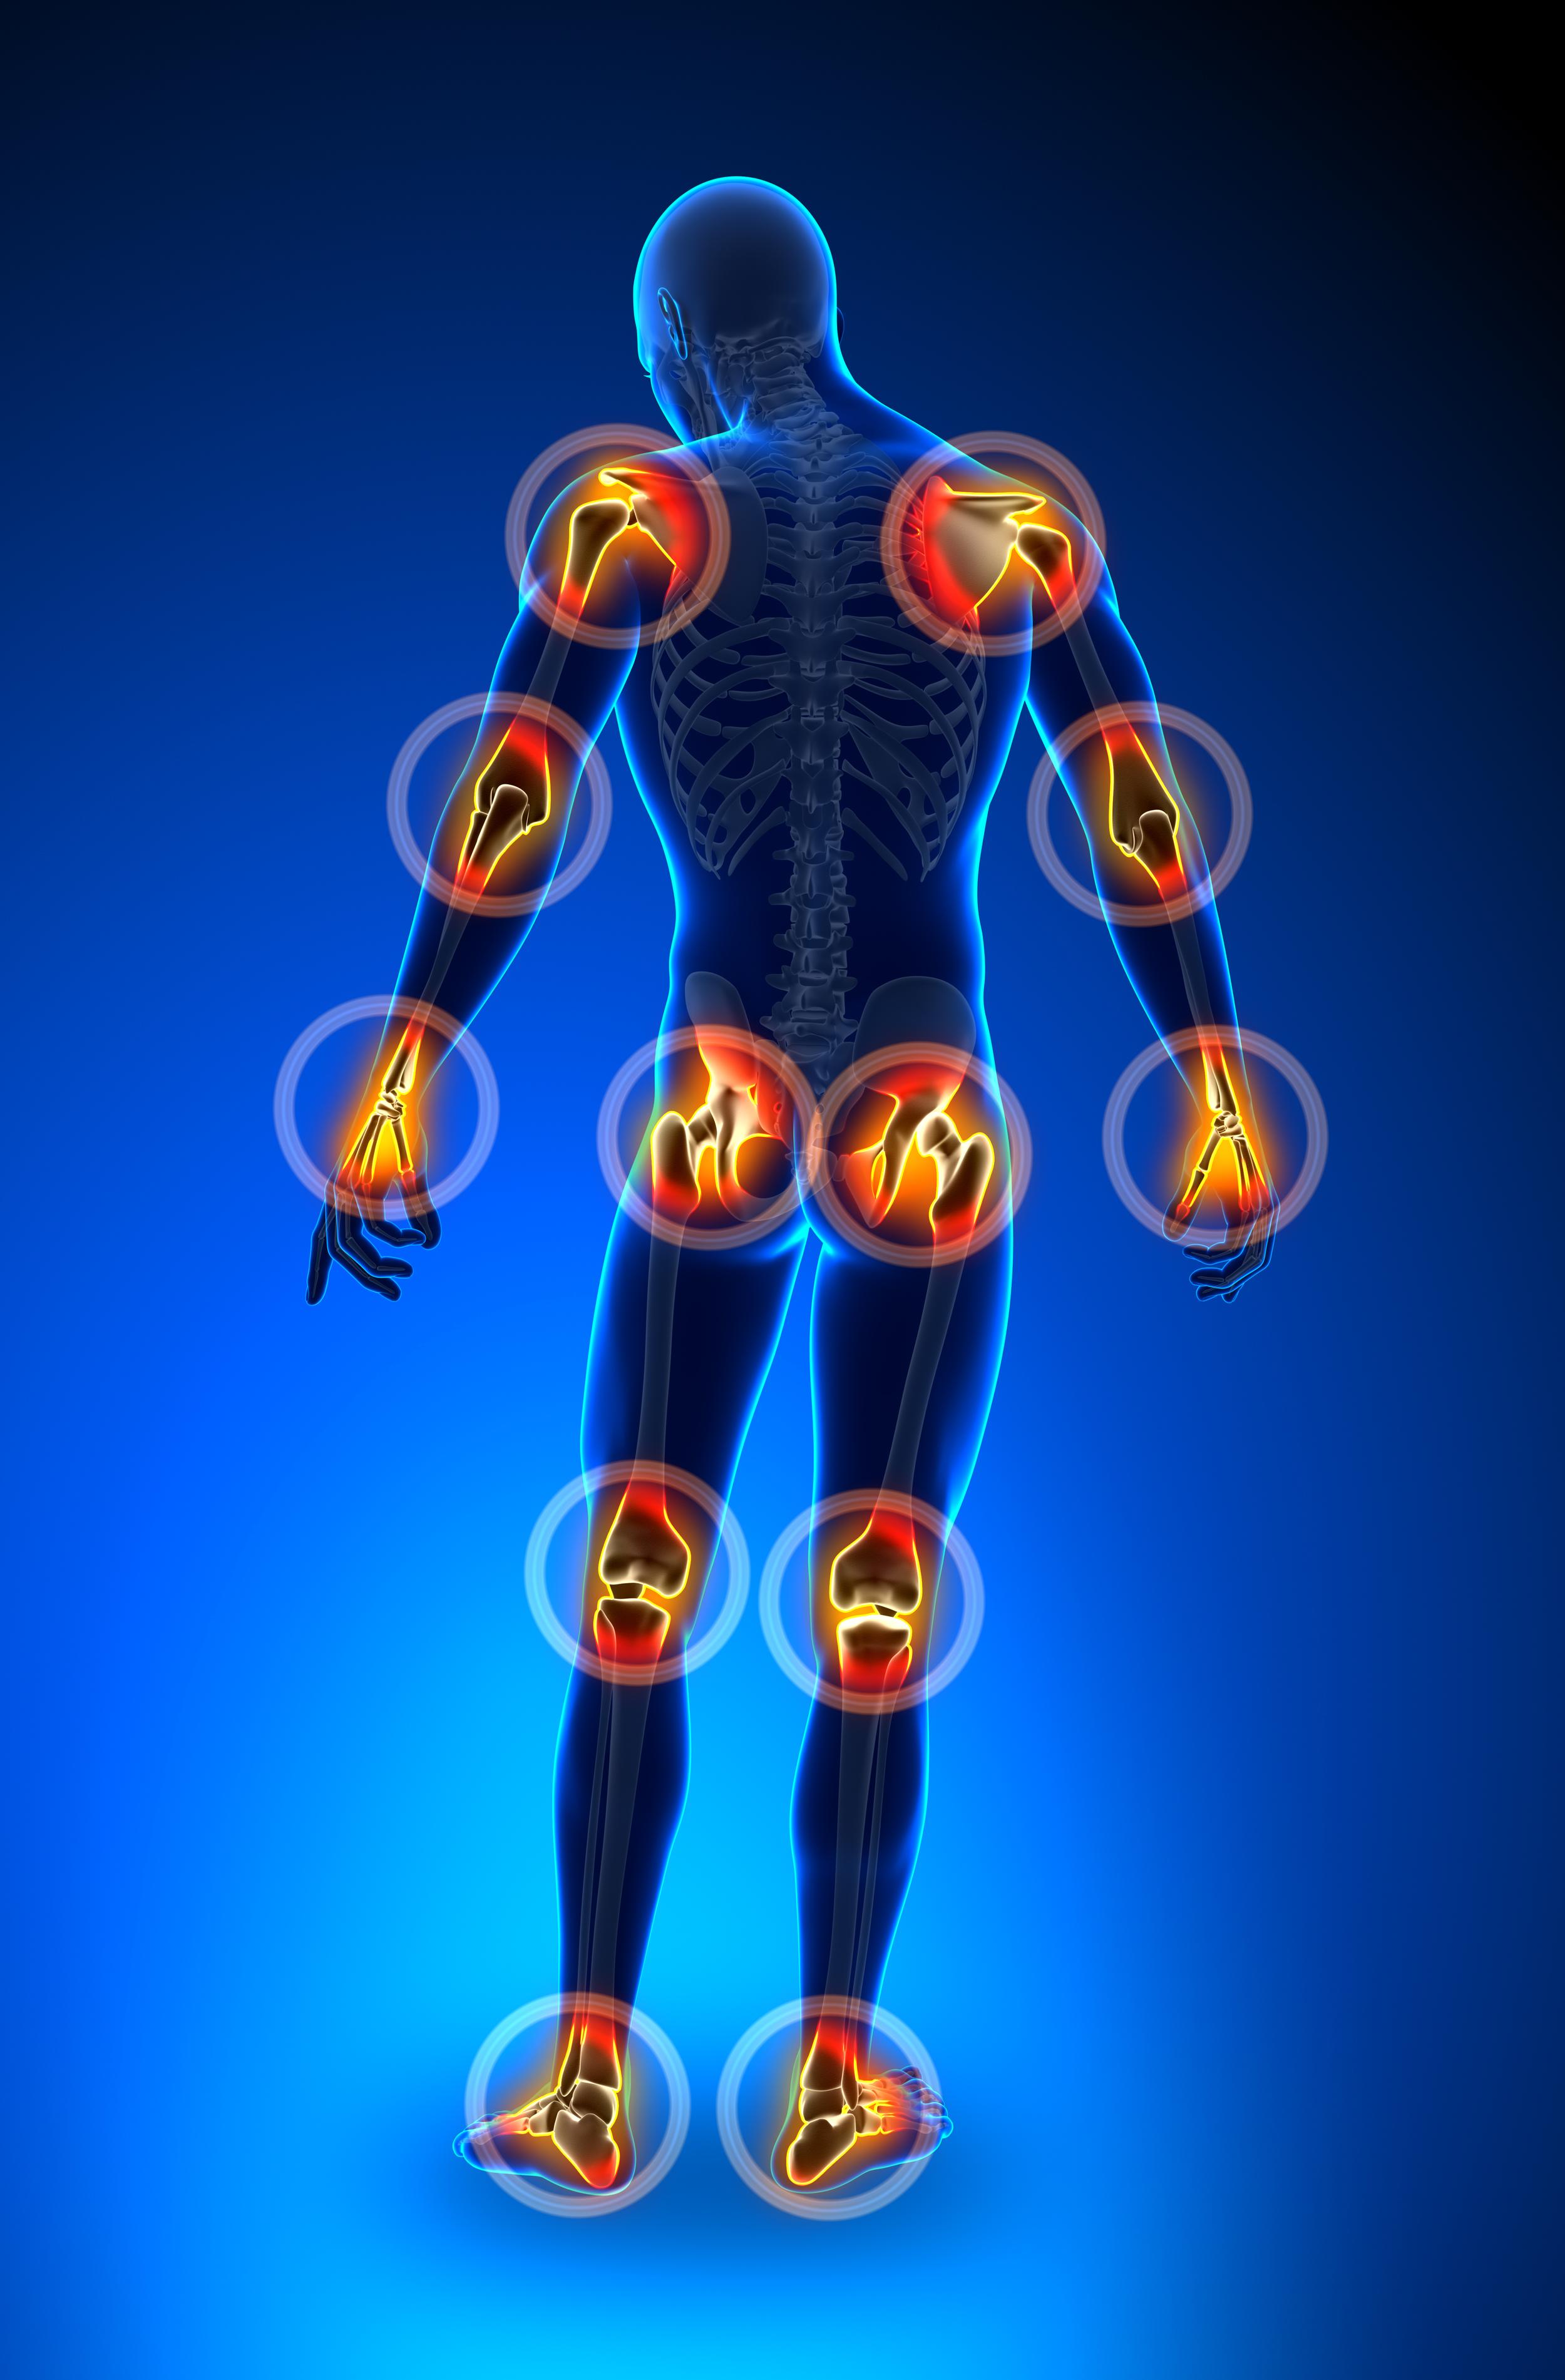 bigstock-Joints-pain--full-figure-44008801.jpg